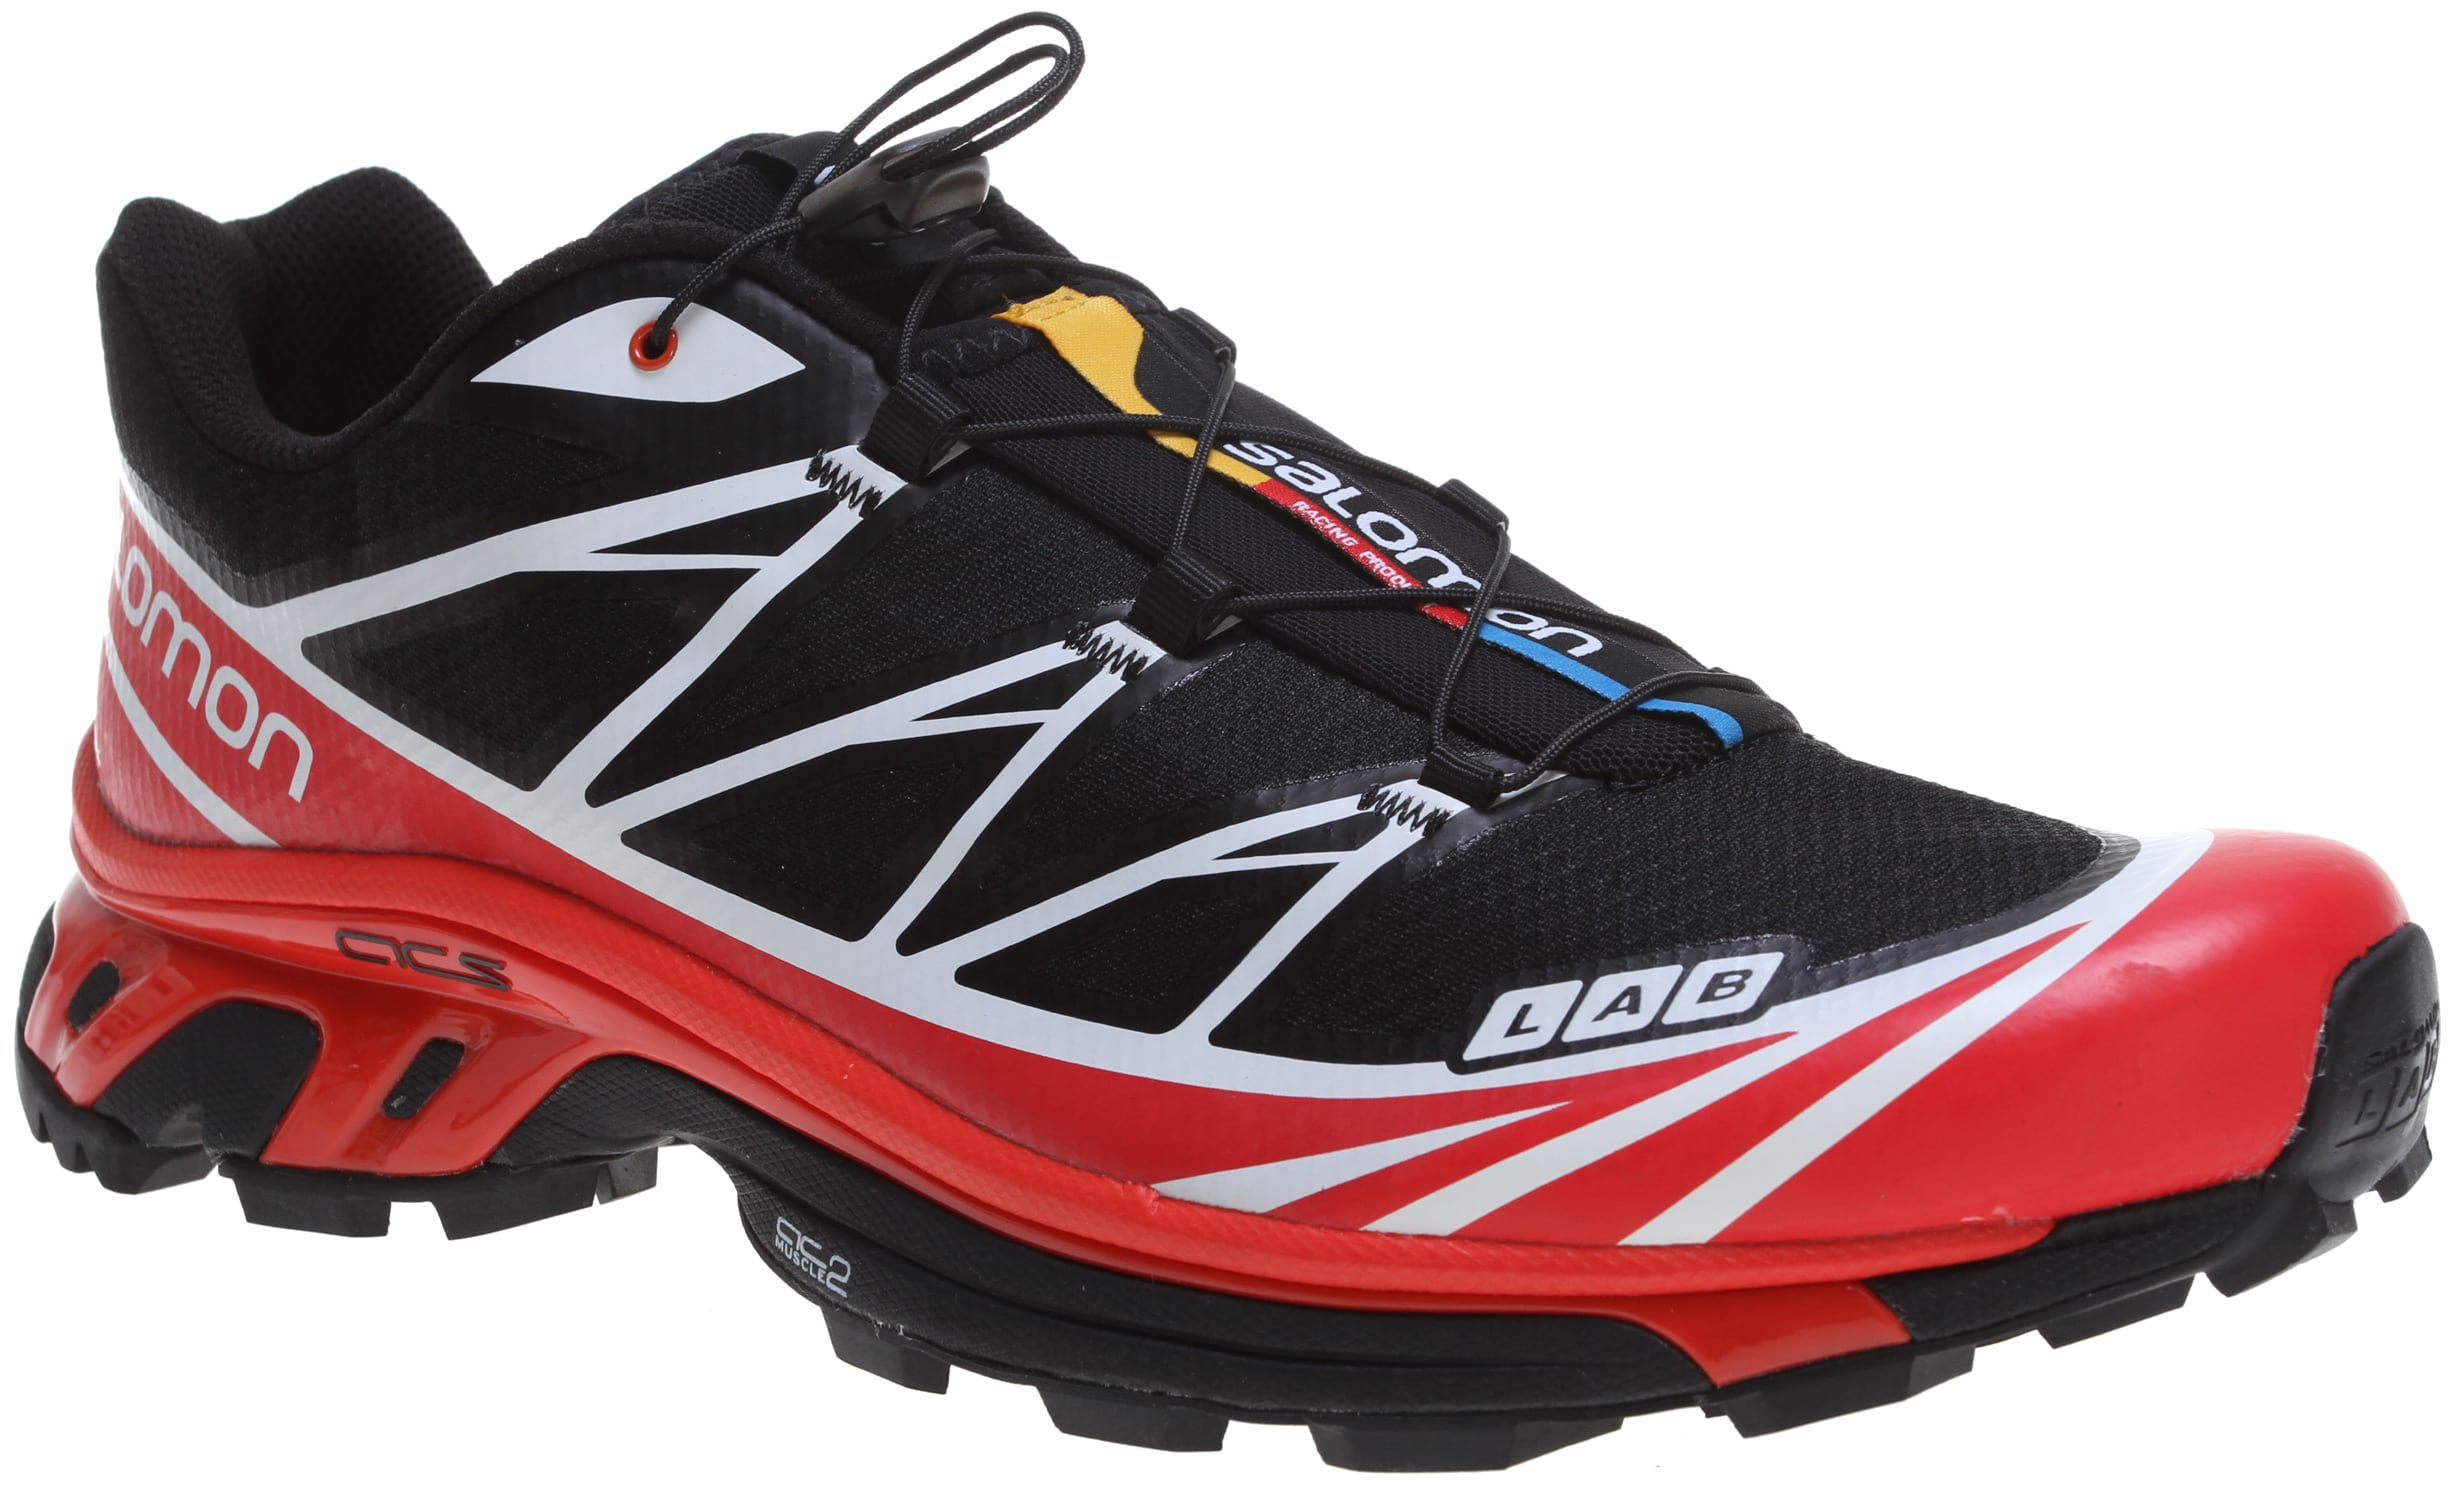 online store f7657 3fc0c Salomon S-Lab XT 6 Softground Hiking Shoes - thumbnail 2